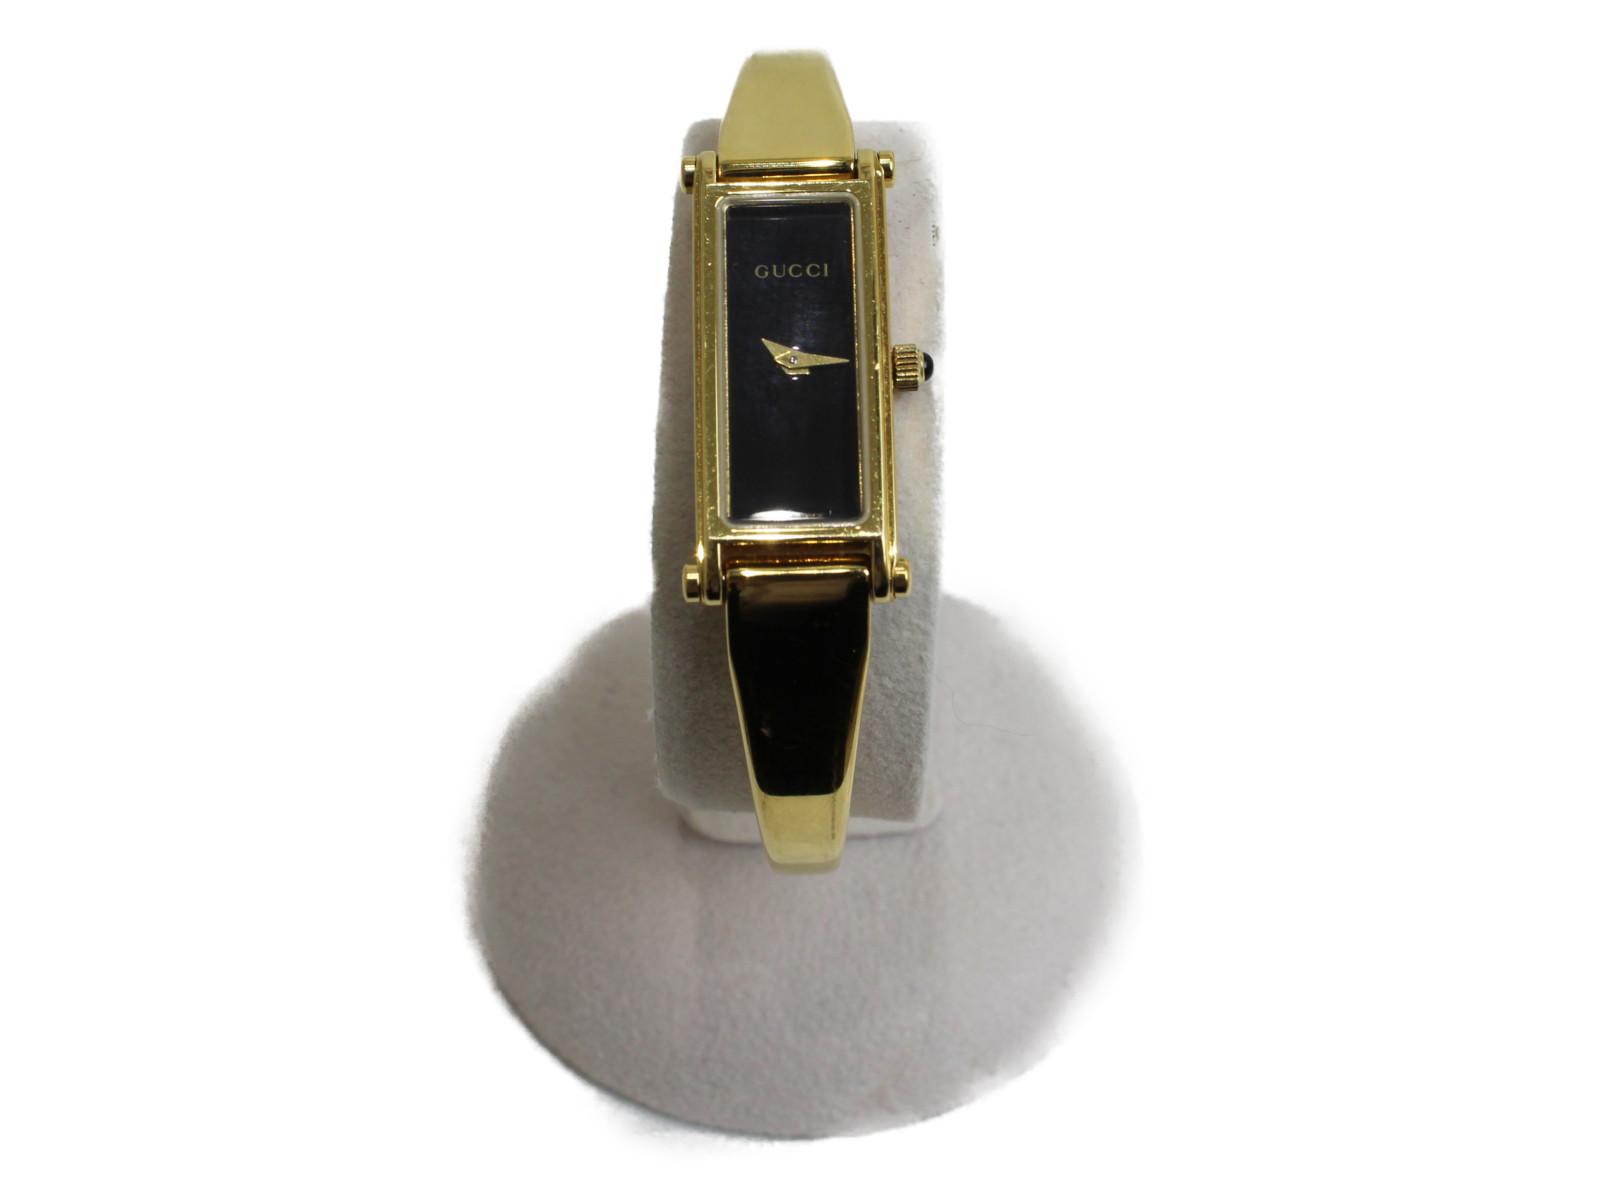 GUCCI グッチ バングルウォッチ クオーツ  ステンレス ゴールド ブラック レディース 腕時計【中古】